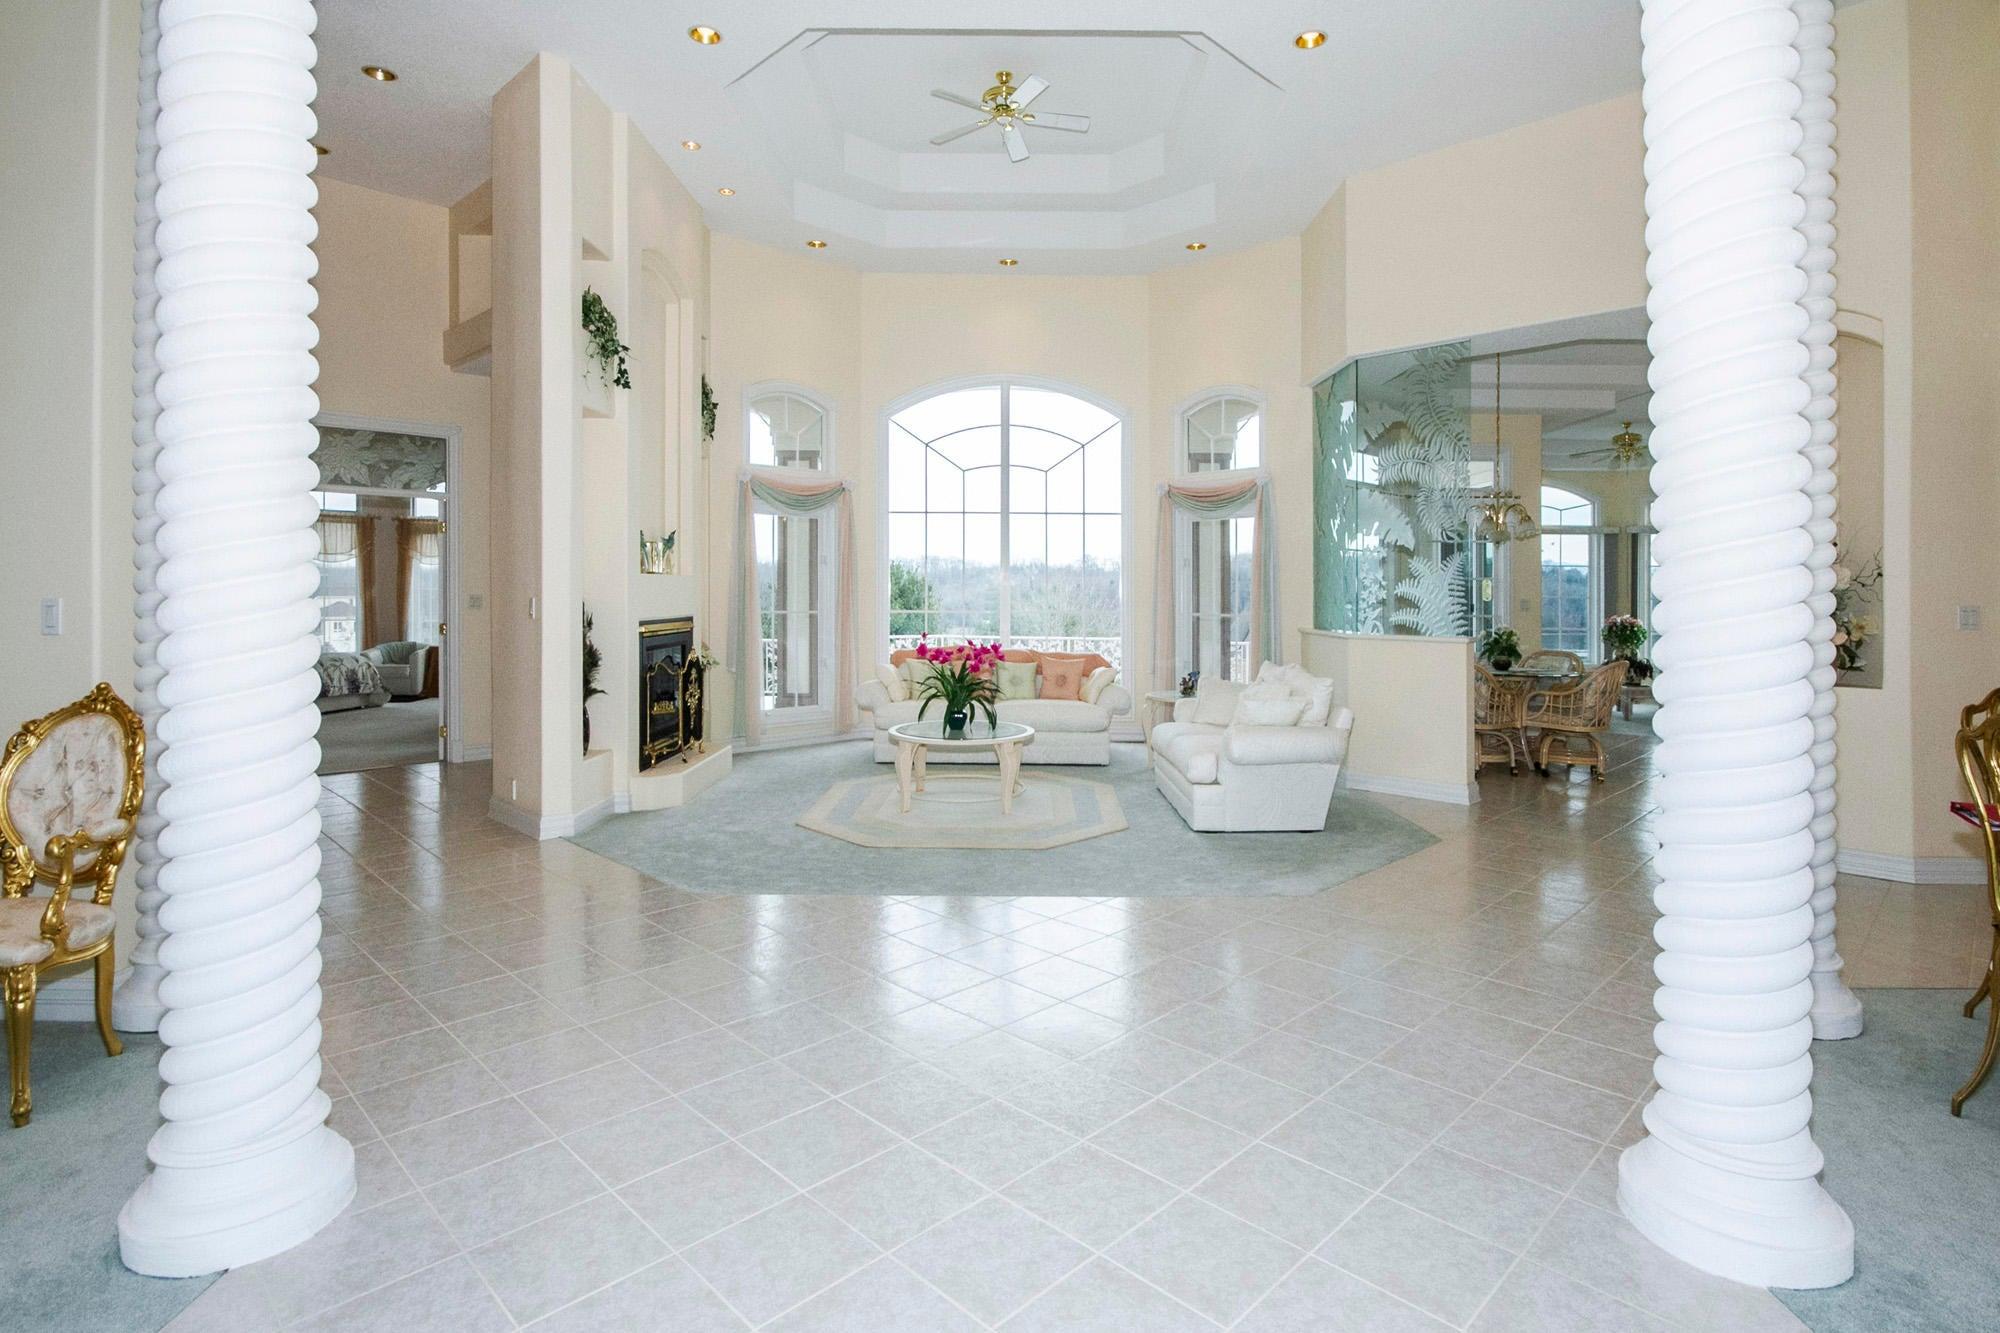 High Ceilings & Open Floor Plan